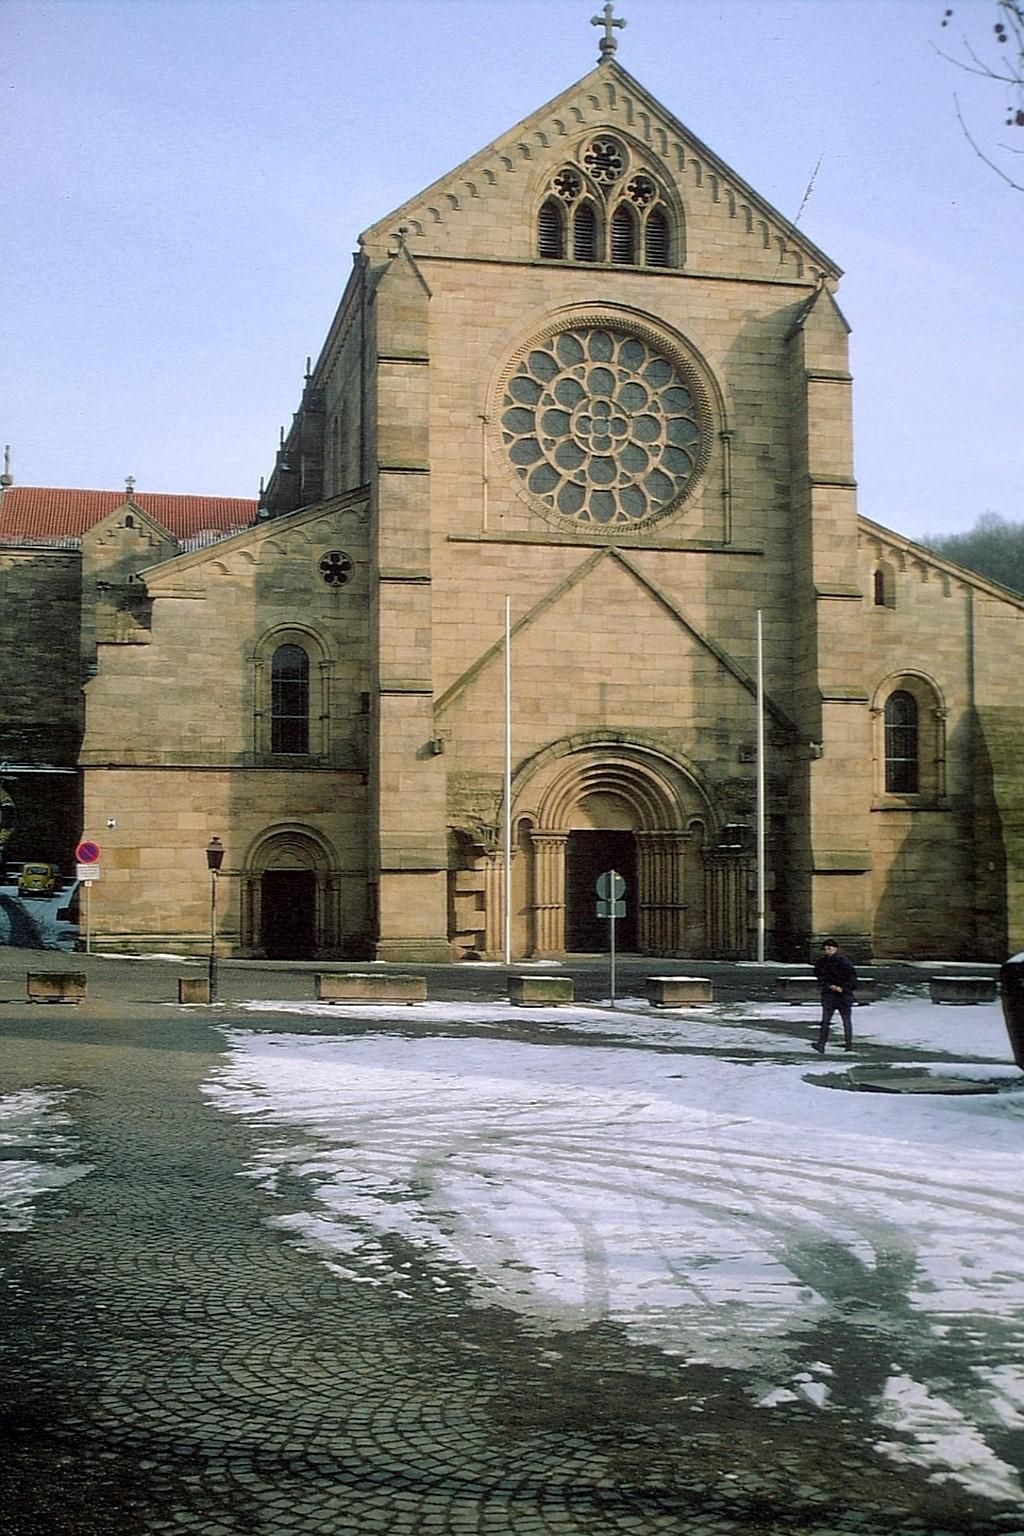 Abteikirche_Otterberg_04.jpg